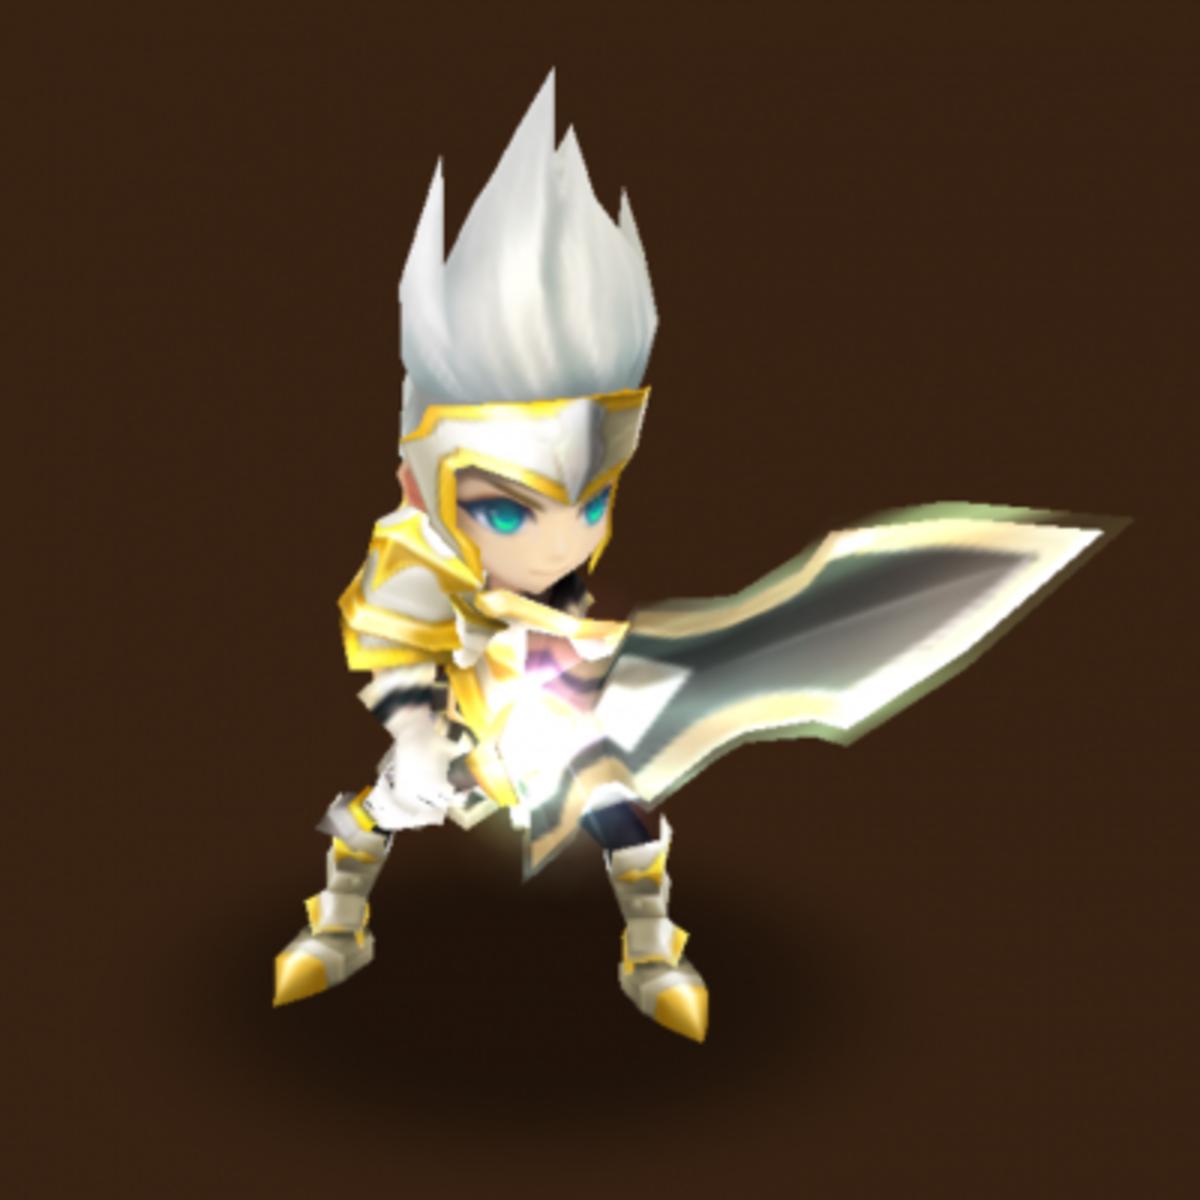 Darion: Light Vagabond